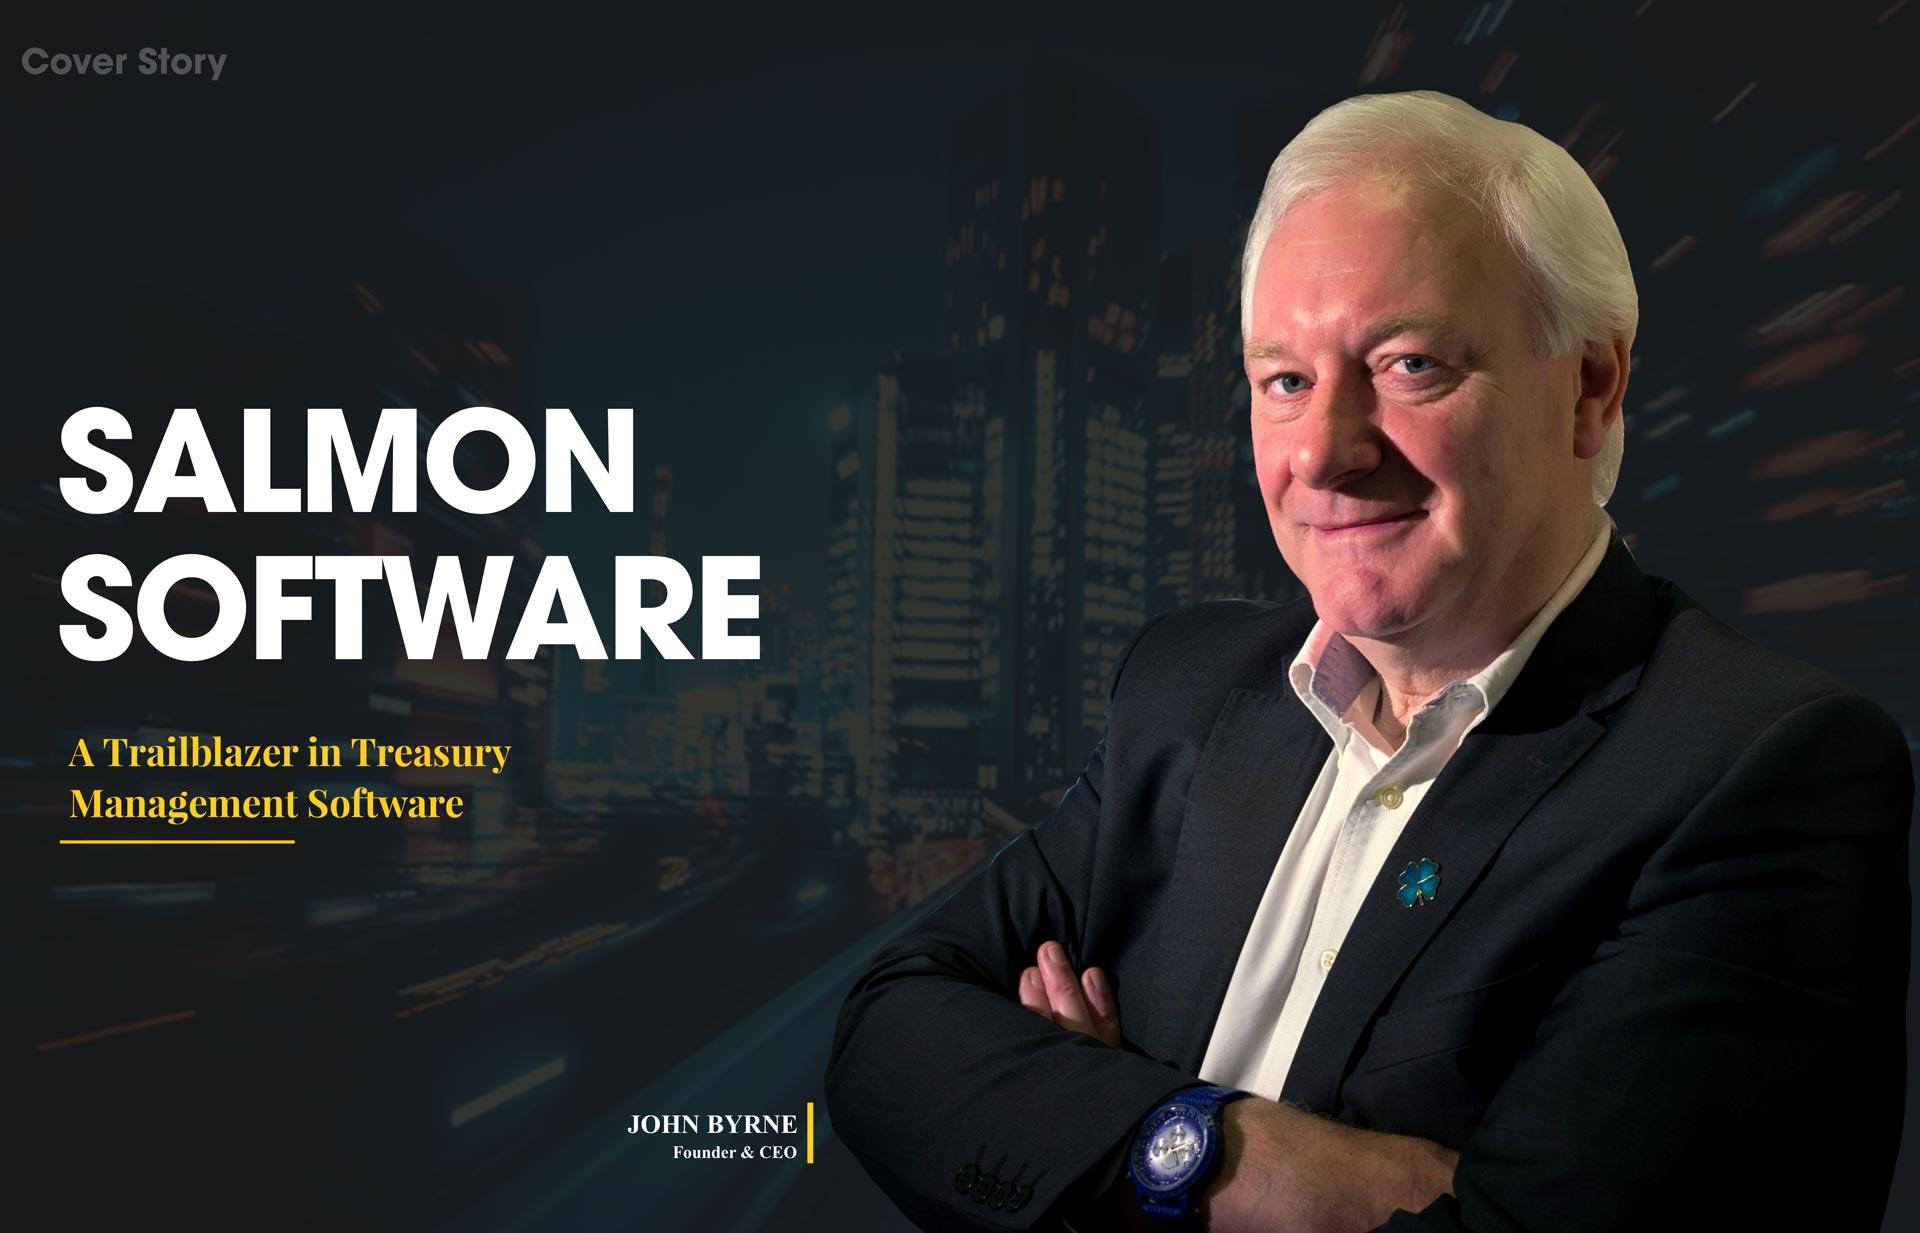 A Trailblazer in Treasury Management Software